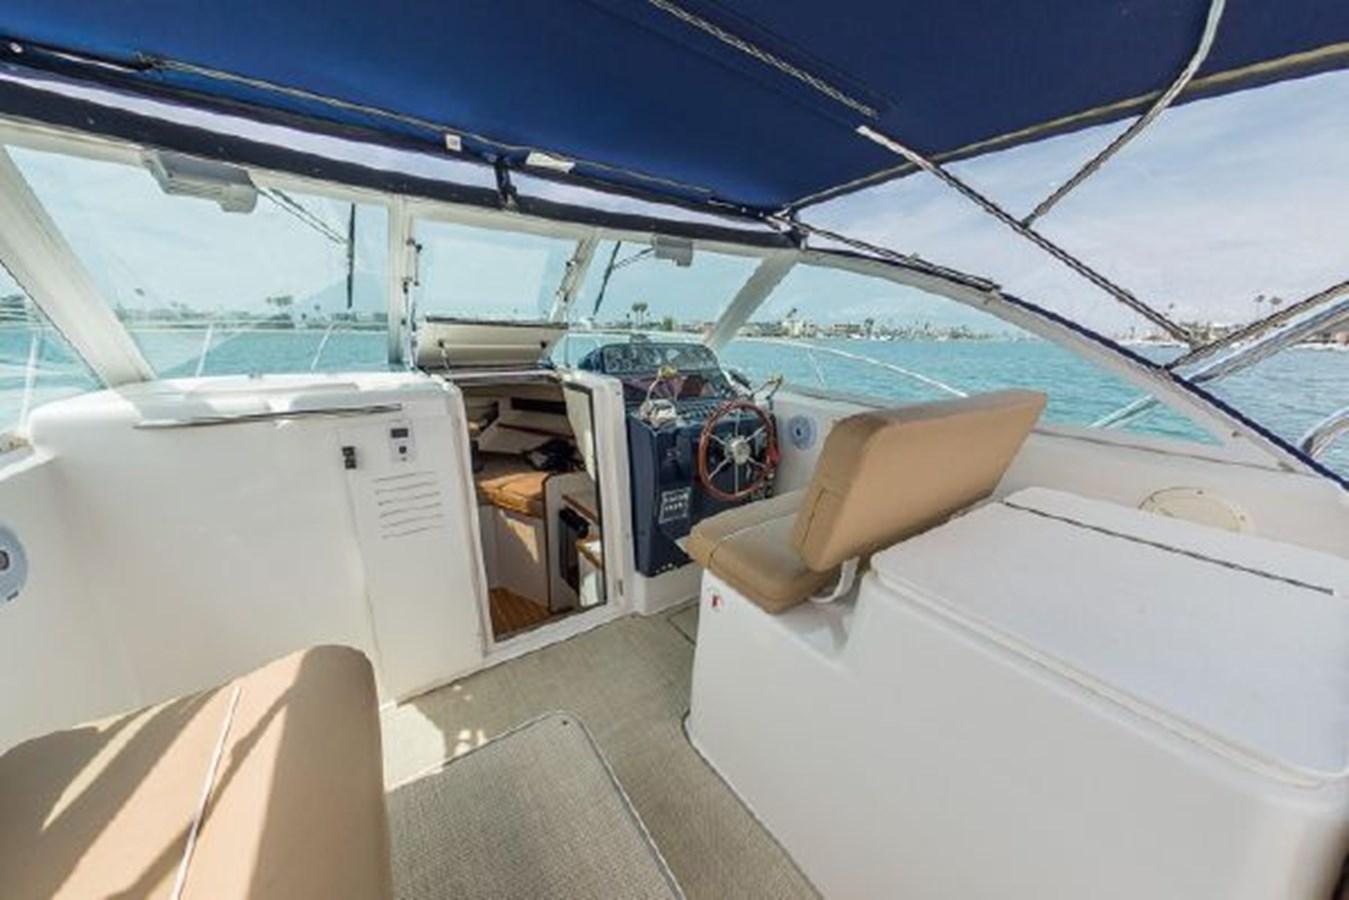 10 2000 TIARA 29 Coronet Sport Fisherman 2705603